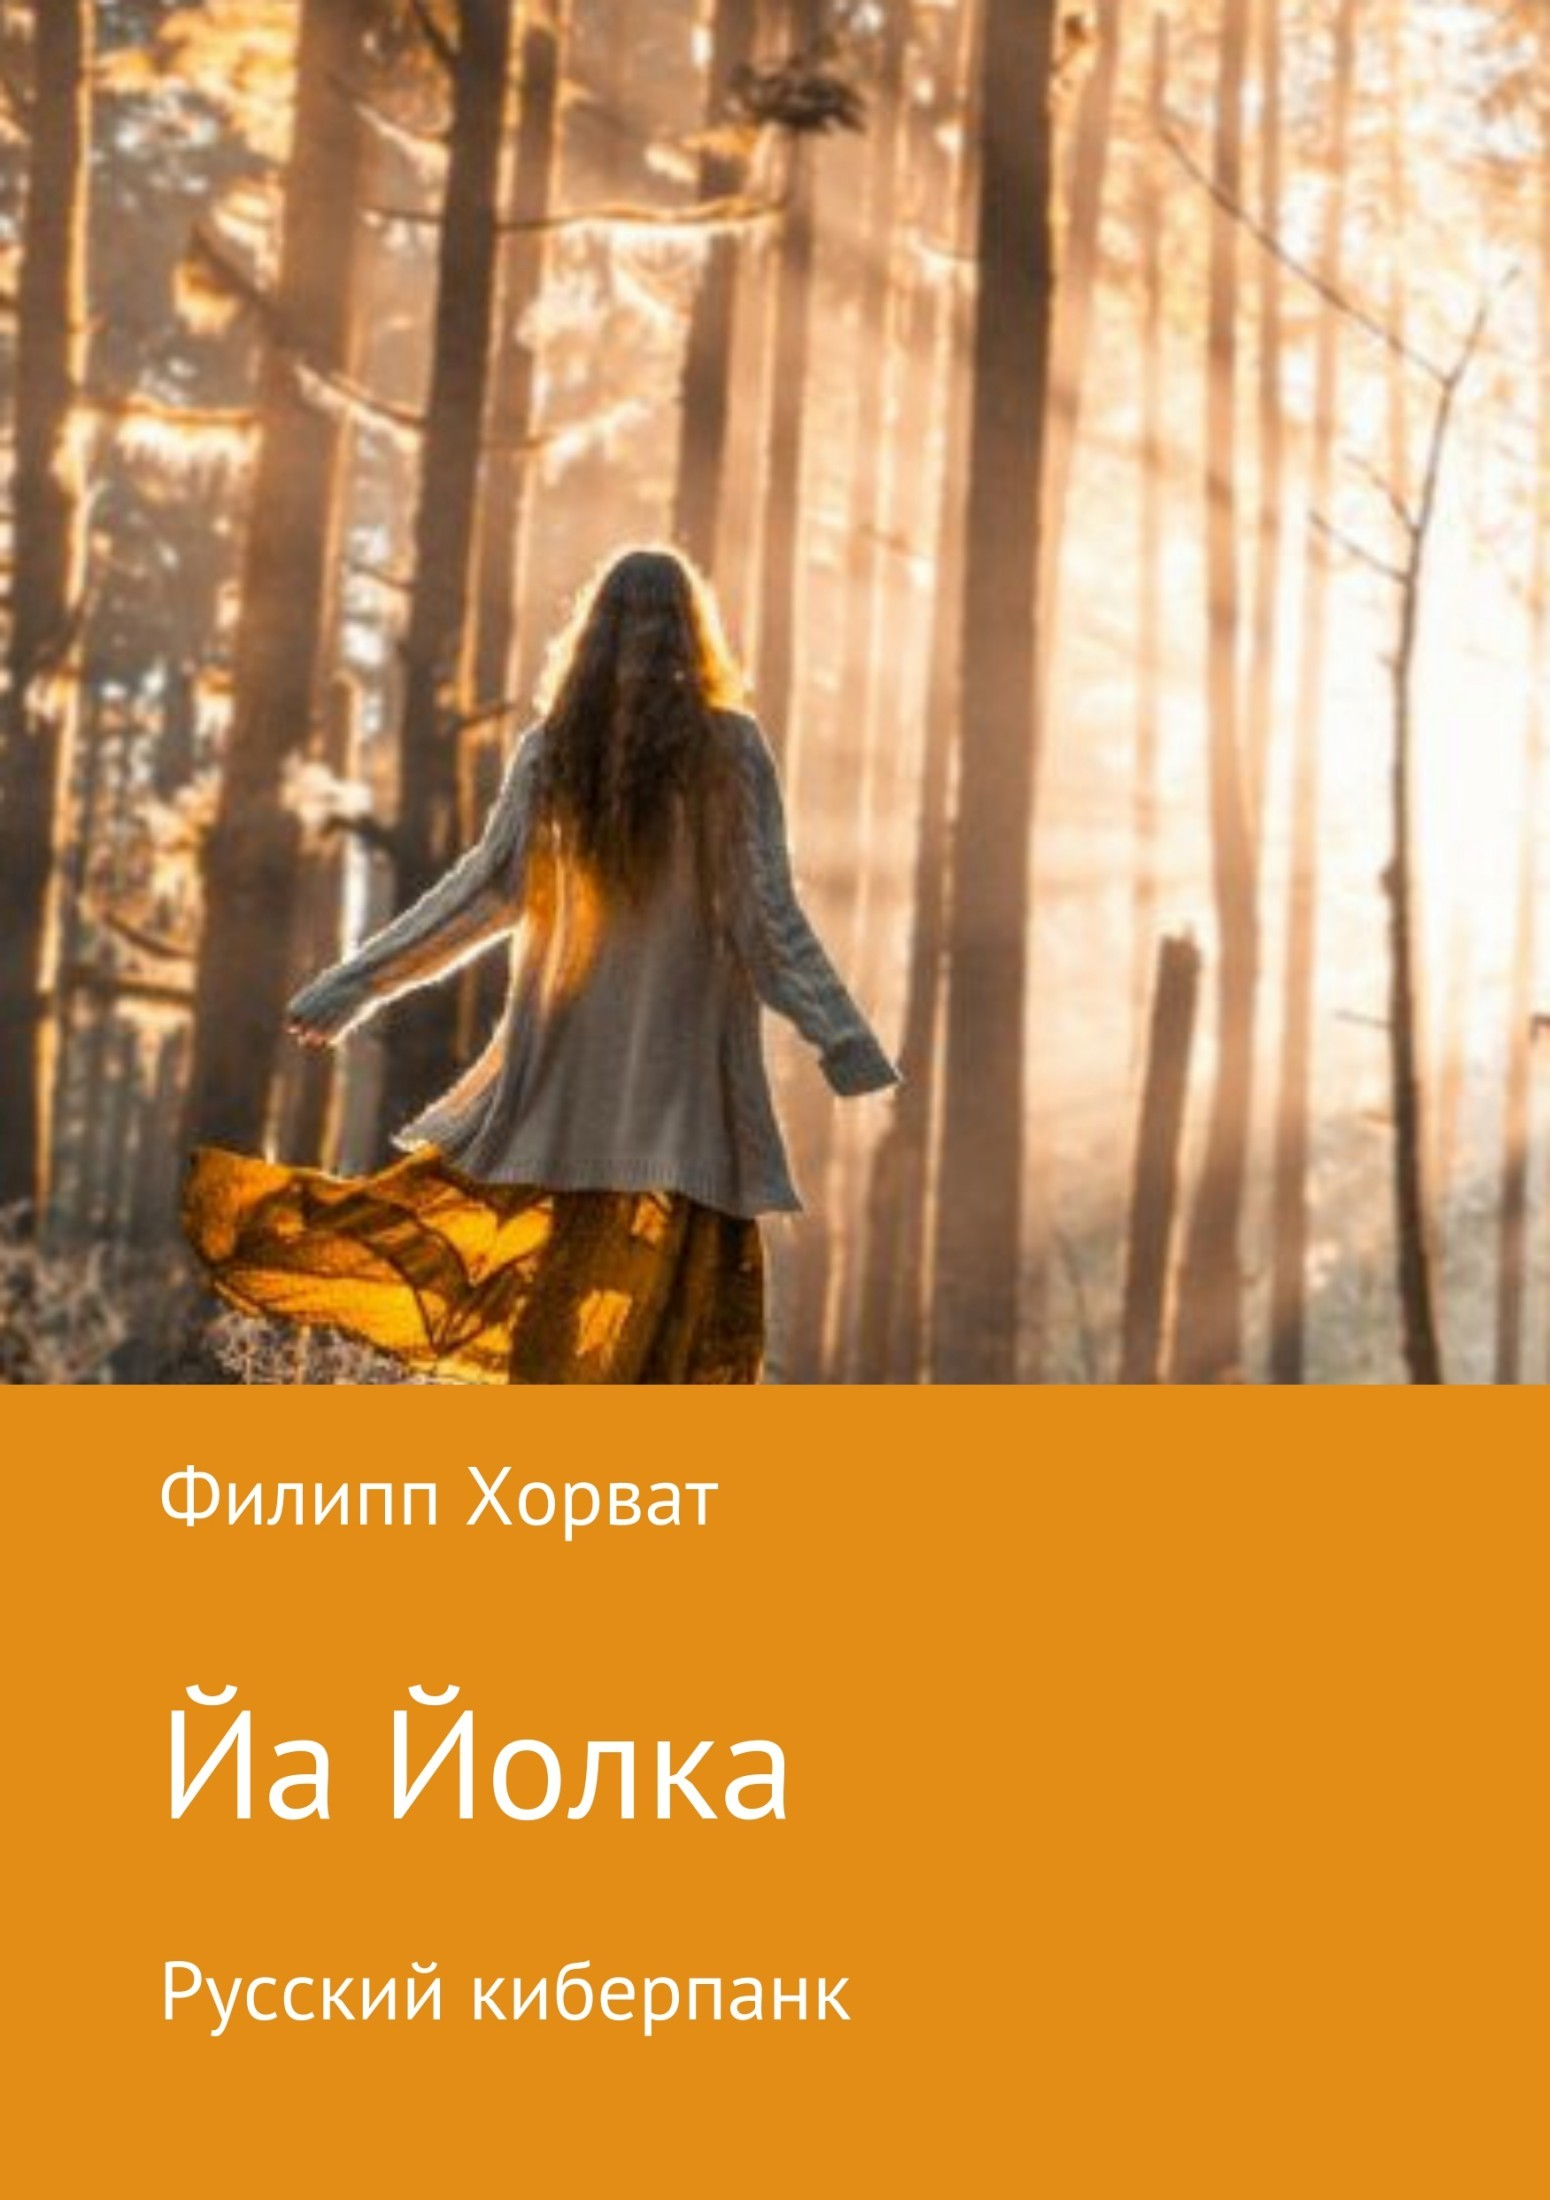 Книга Йа Йолка. Русский киберпанк